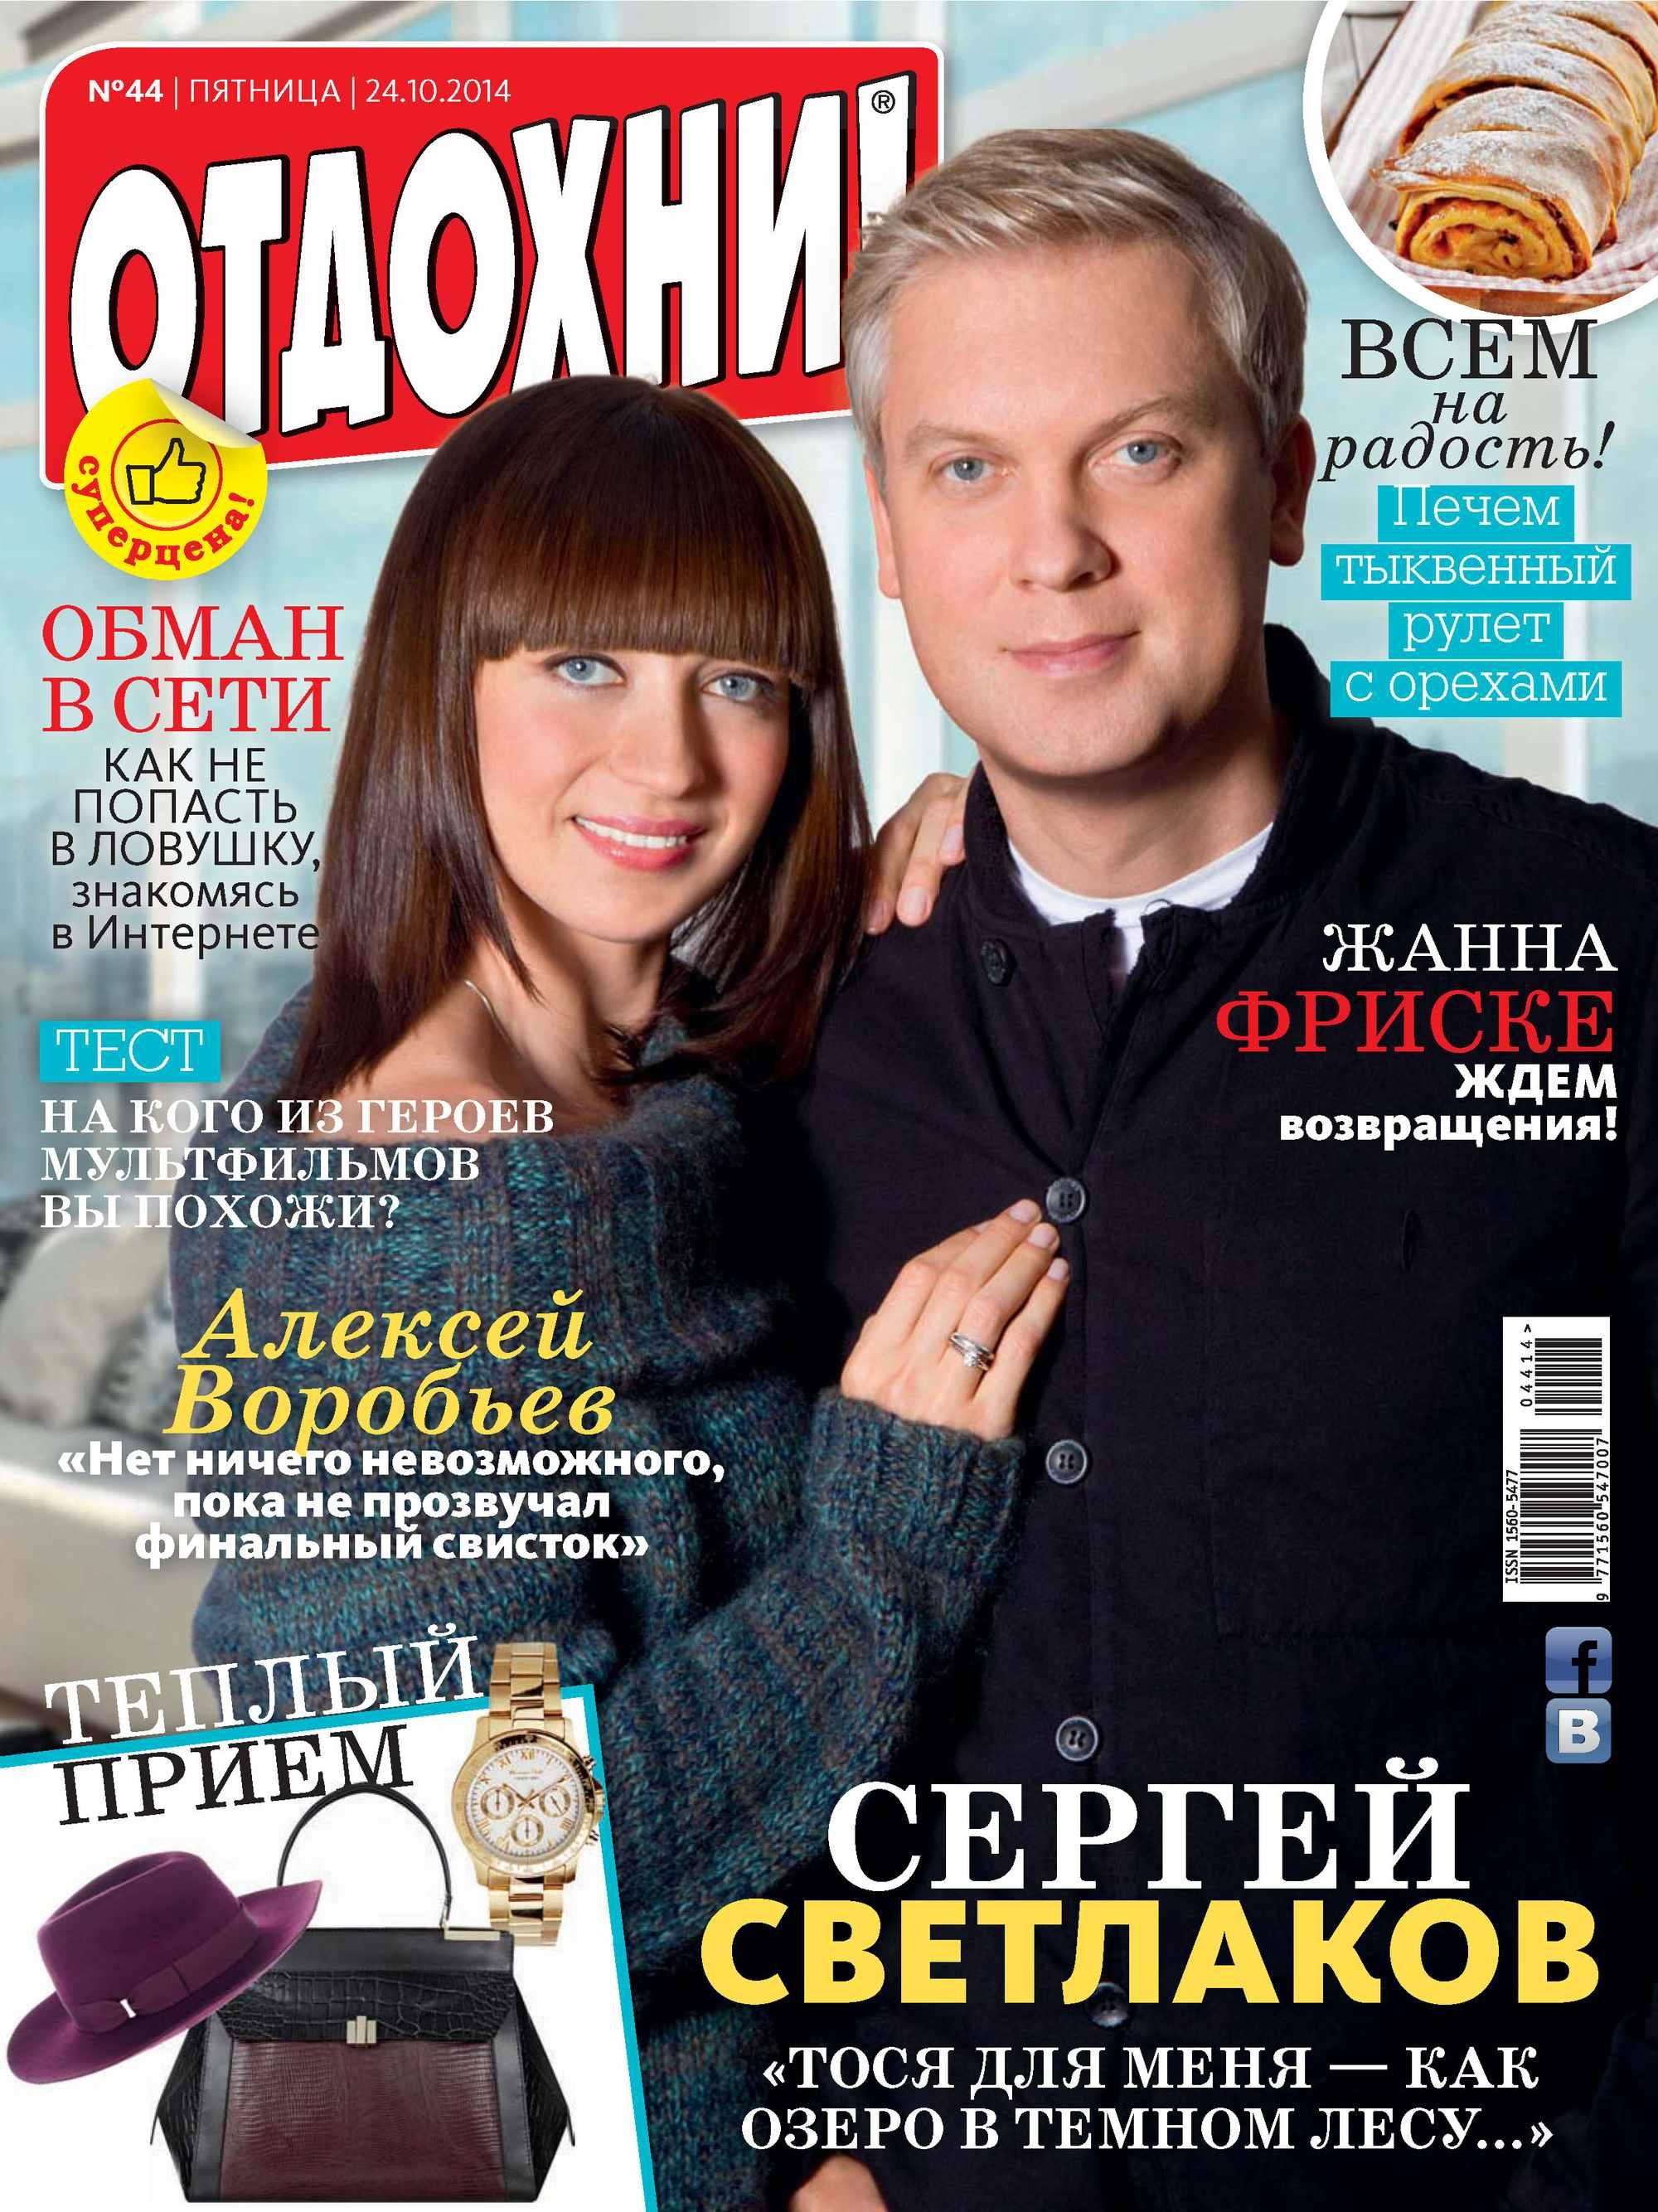 ИД «Бурда» Журнал «Отдохни!» №44/2014 ид бурда журнал отдохни 15 2017